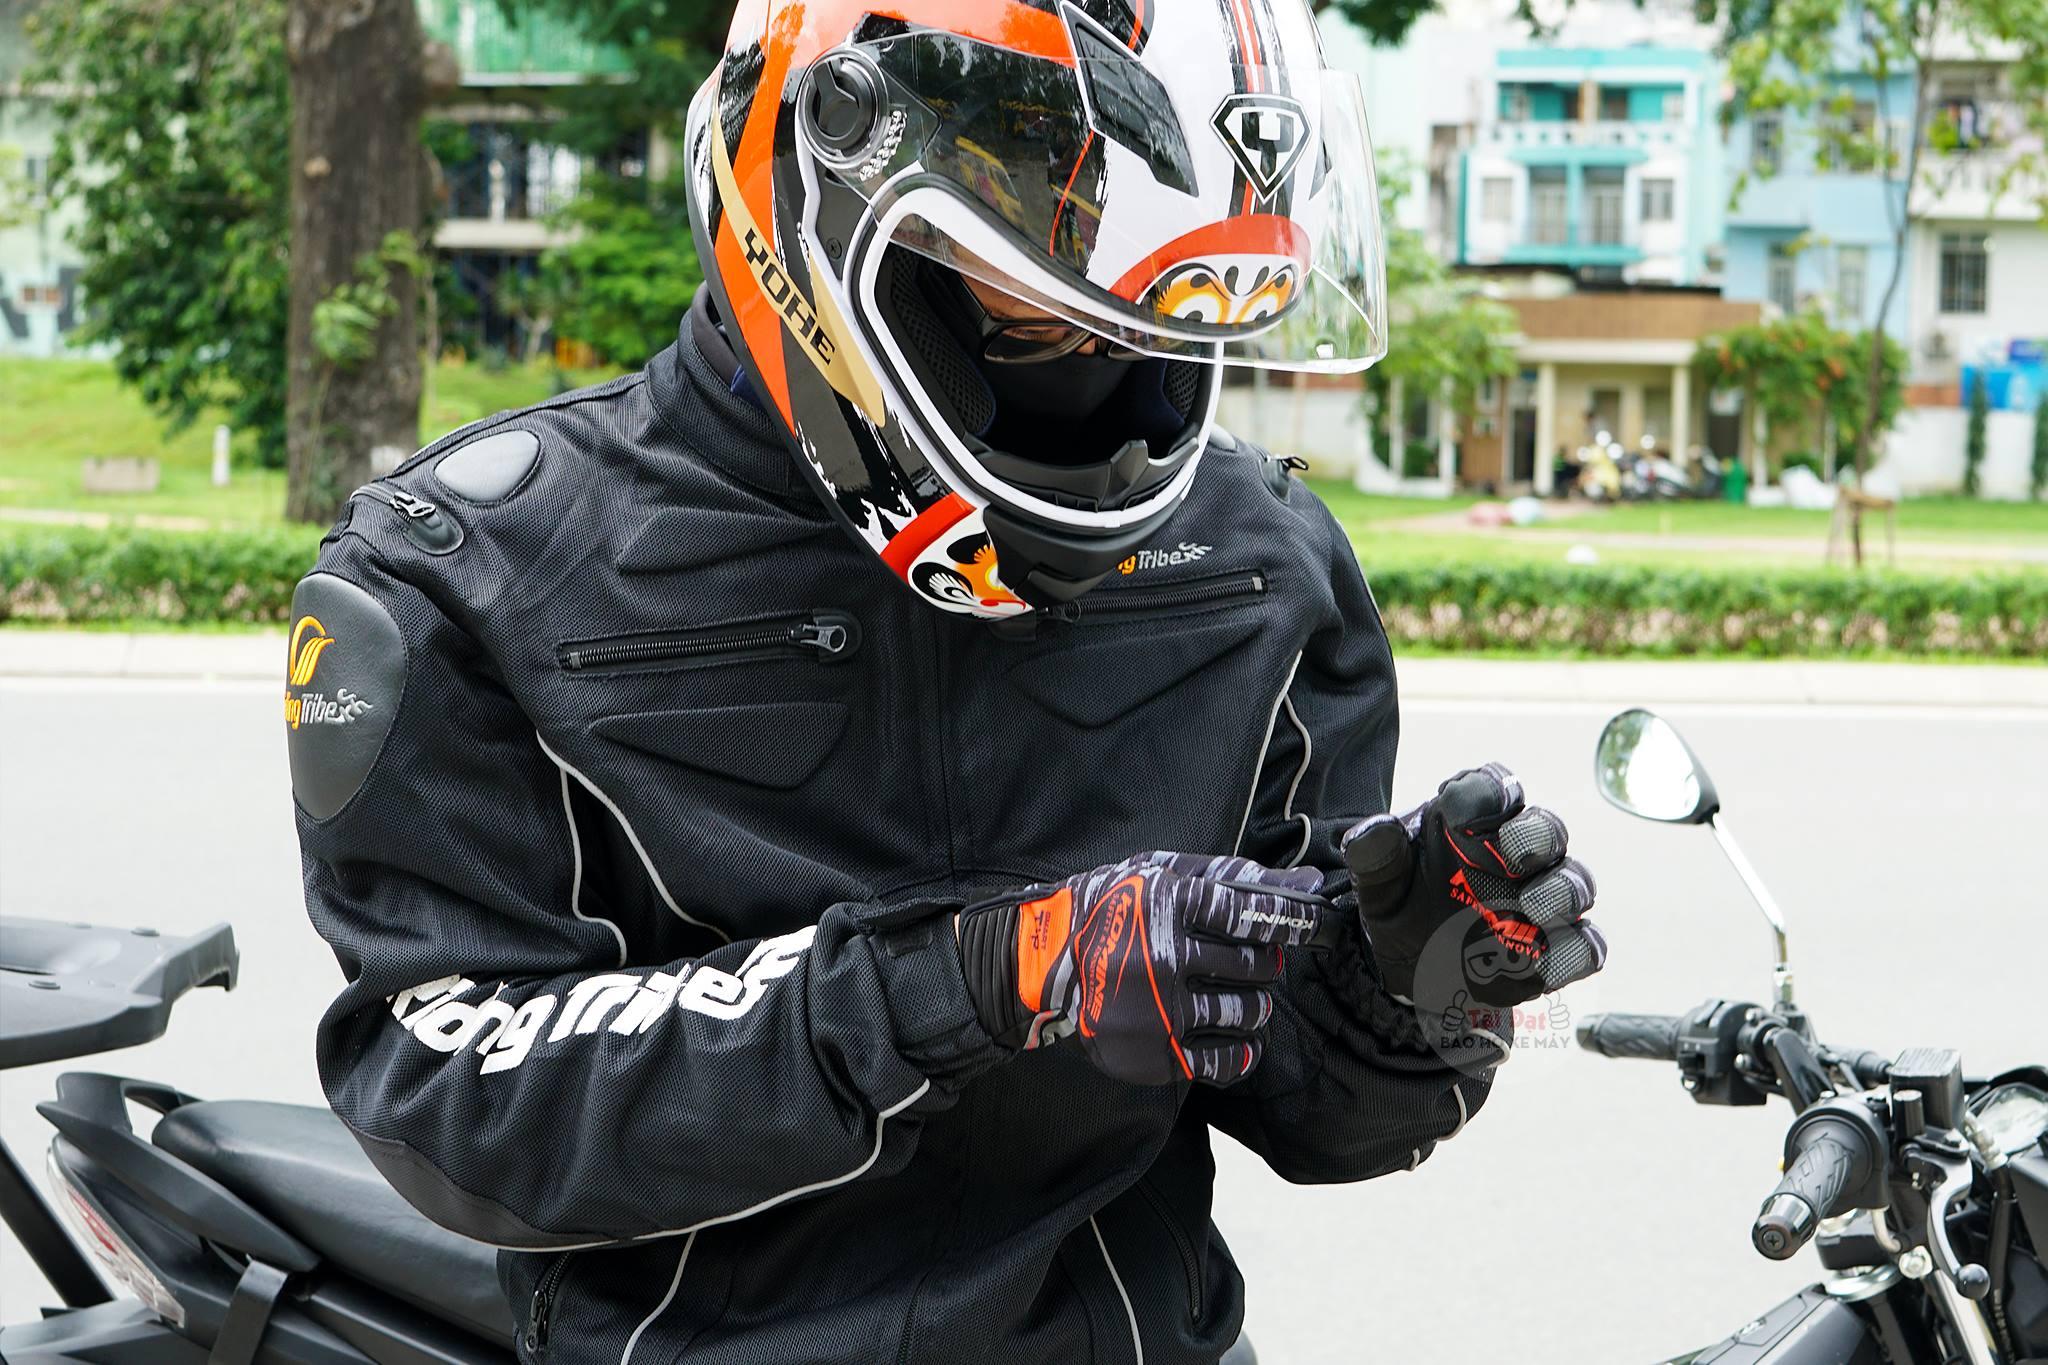 gang-tay-20